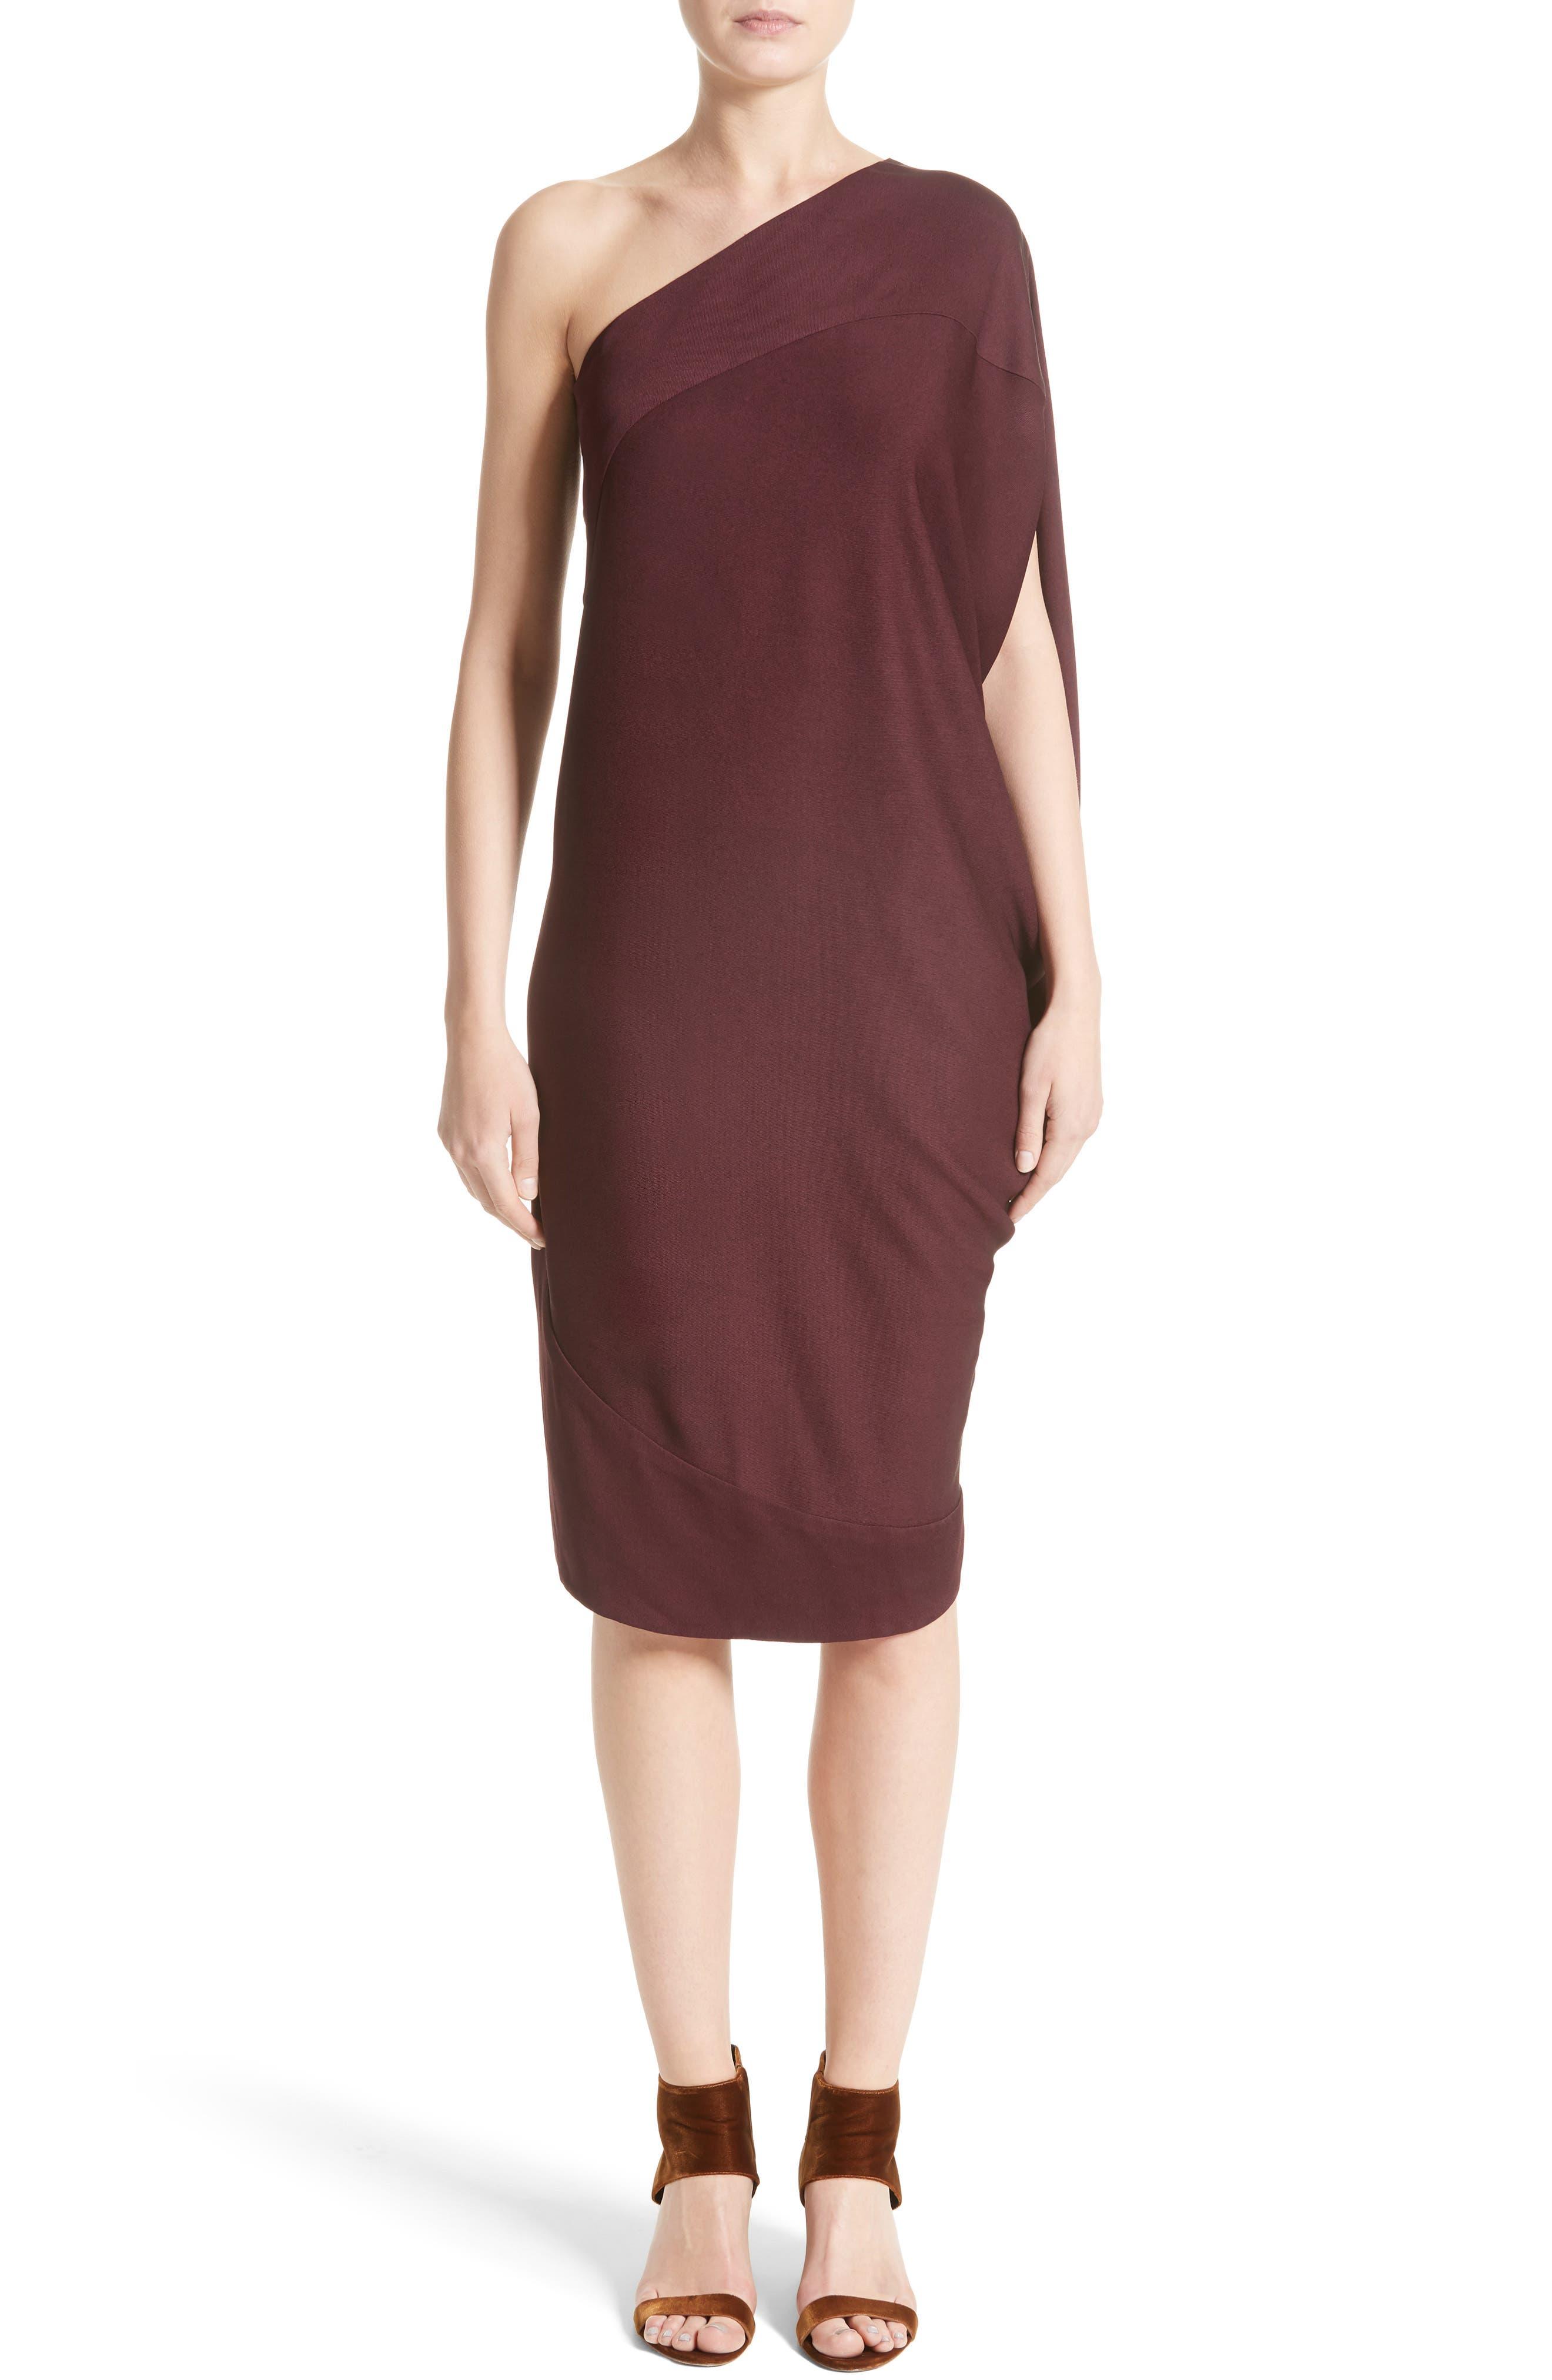 Alternate Image 1 Selected - Zero + Maria Cornejo Lui Eco Drape One-Shoulder Dress